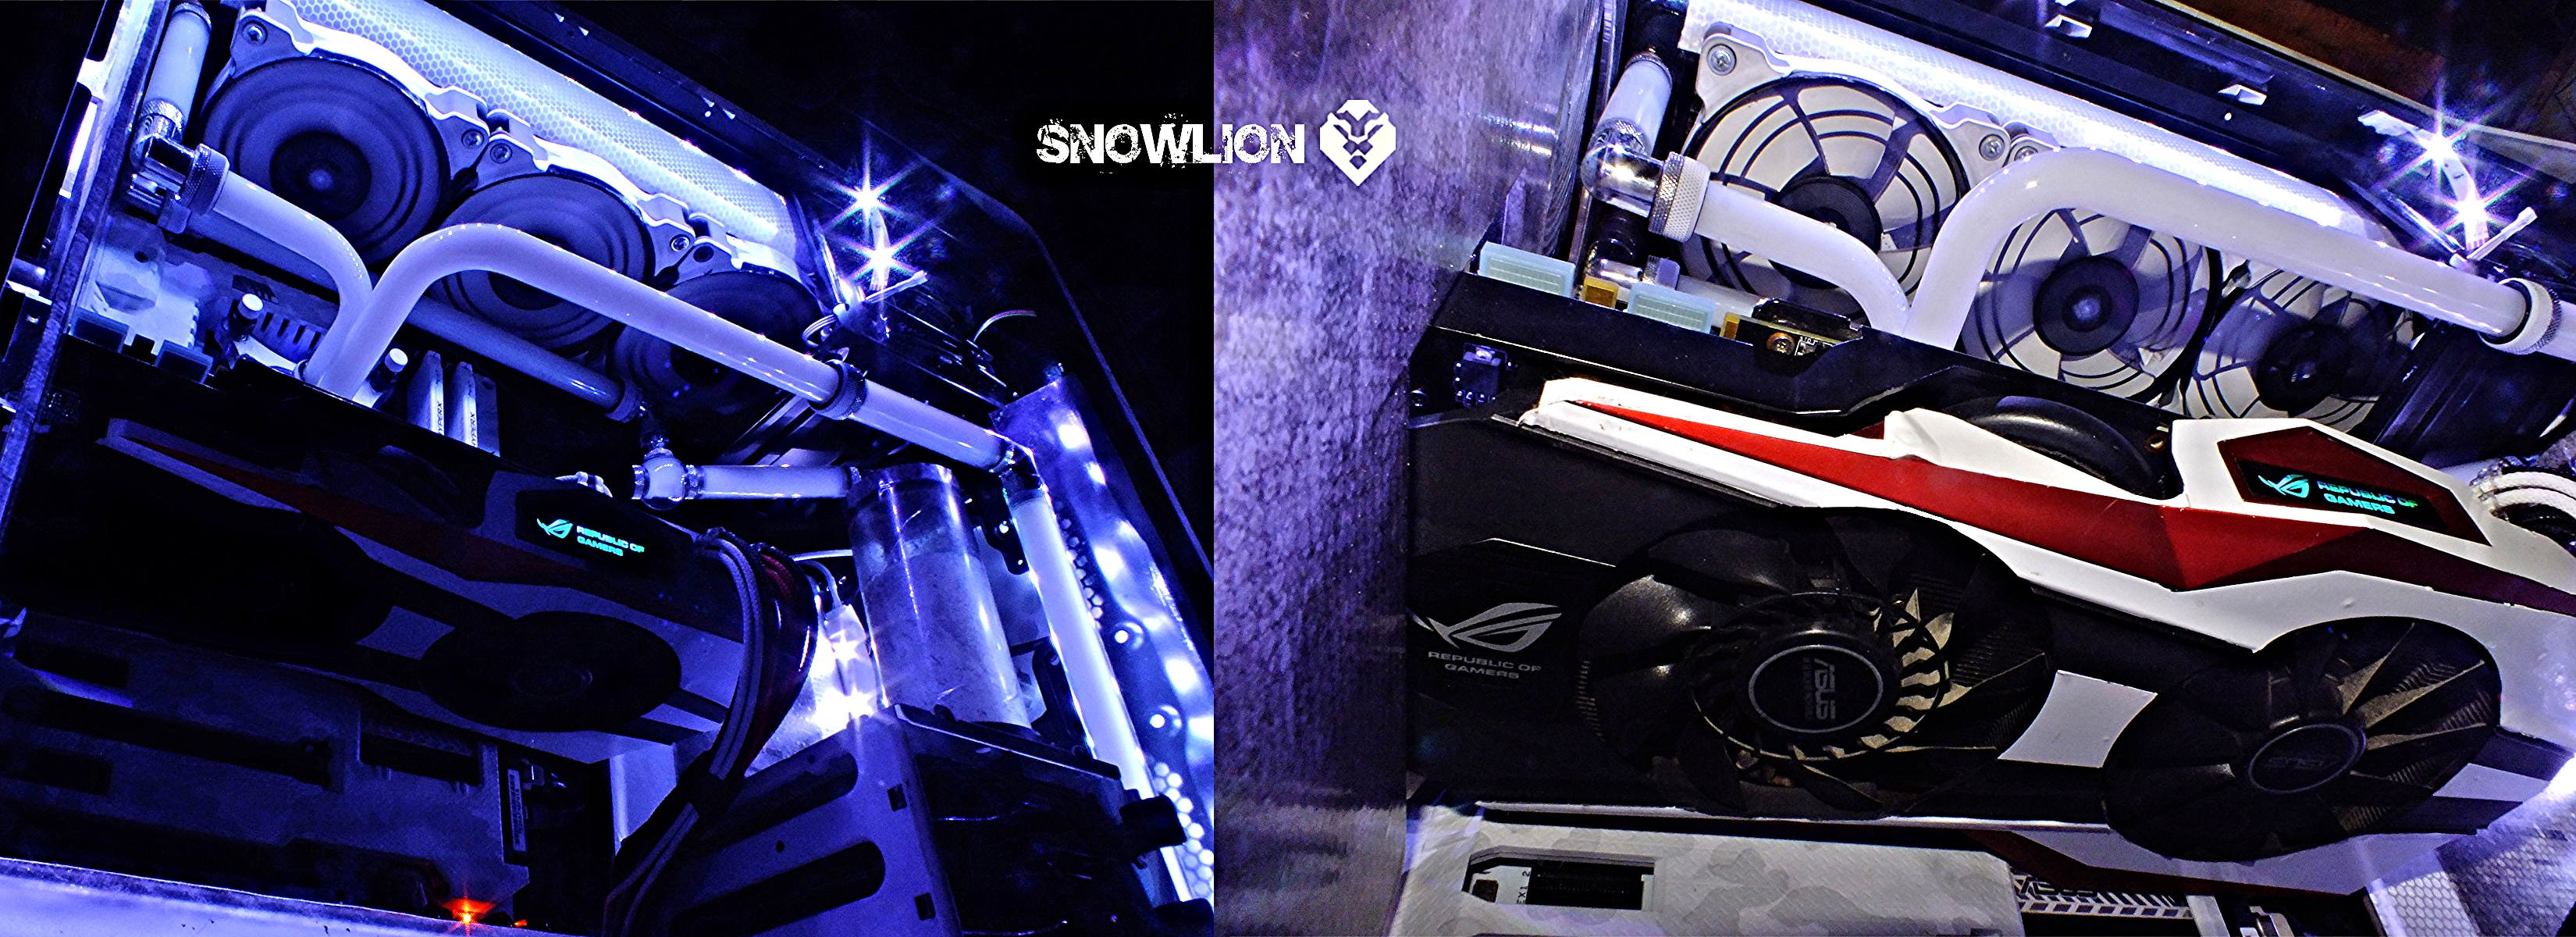 snowlion92